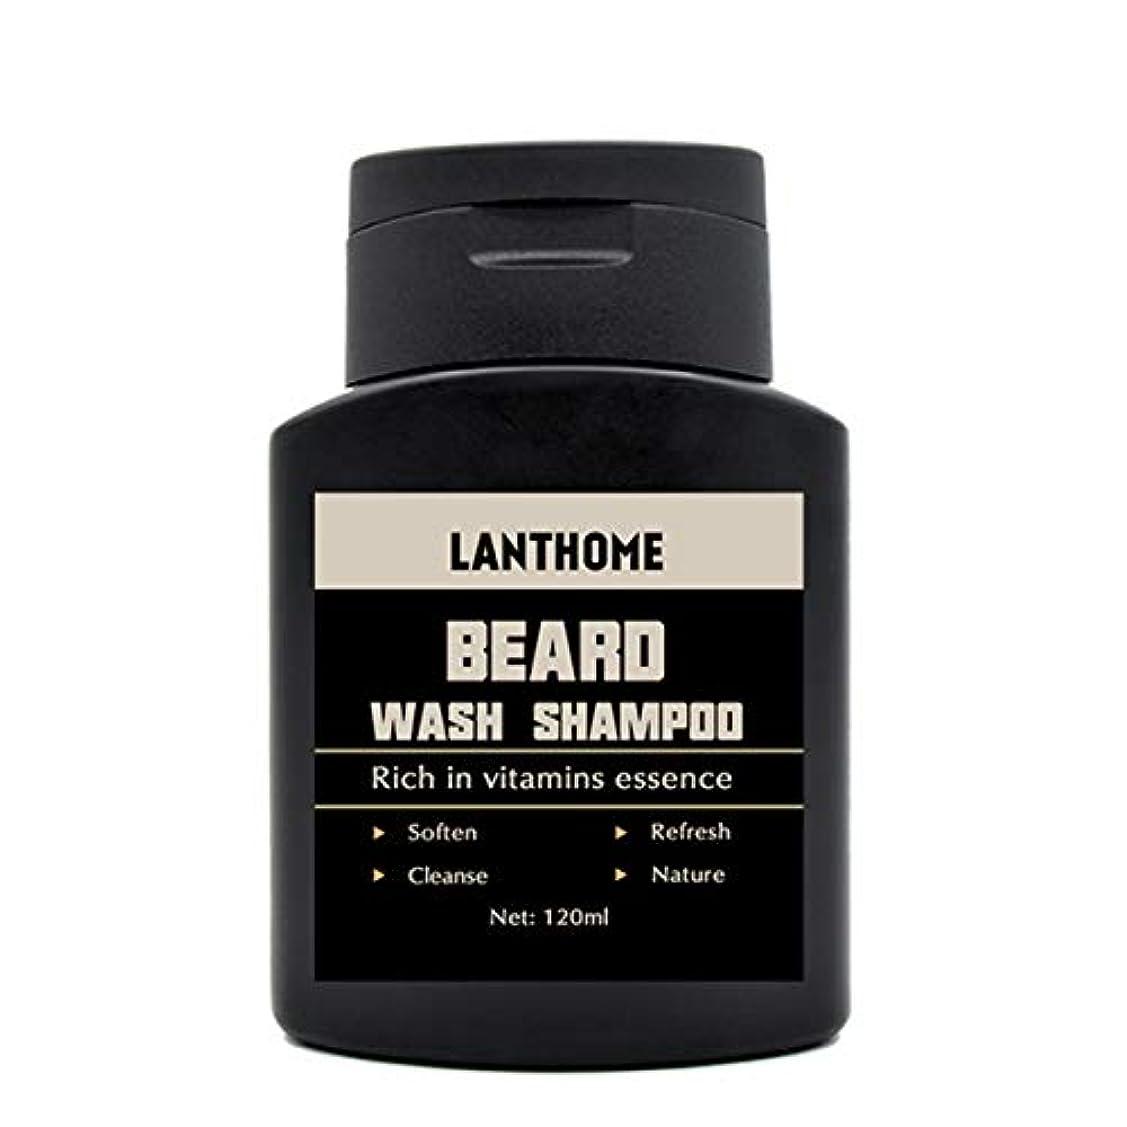 OUNONA ラントホームビアードウォッシュシャンプーコンディショナーモイスチャライザービアクリーン液体ヘアビタミンエッセンスヘアケア栄養